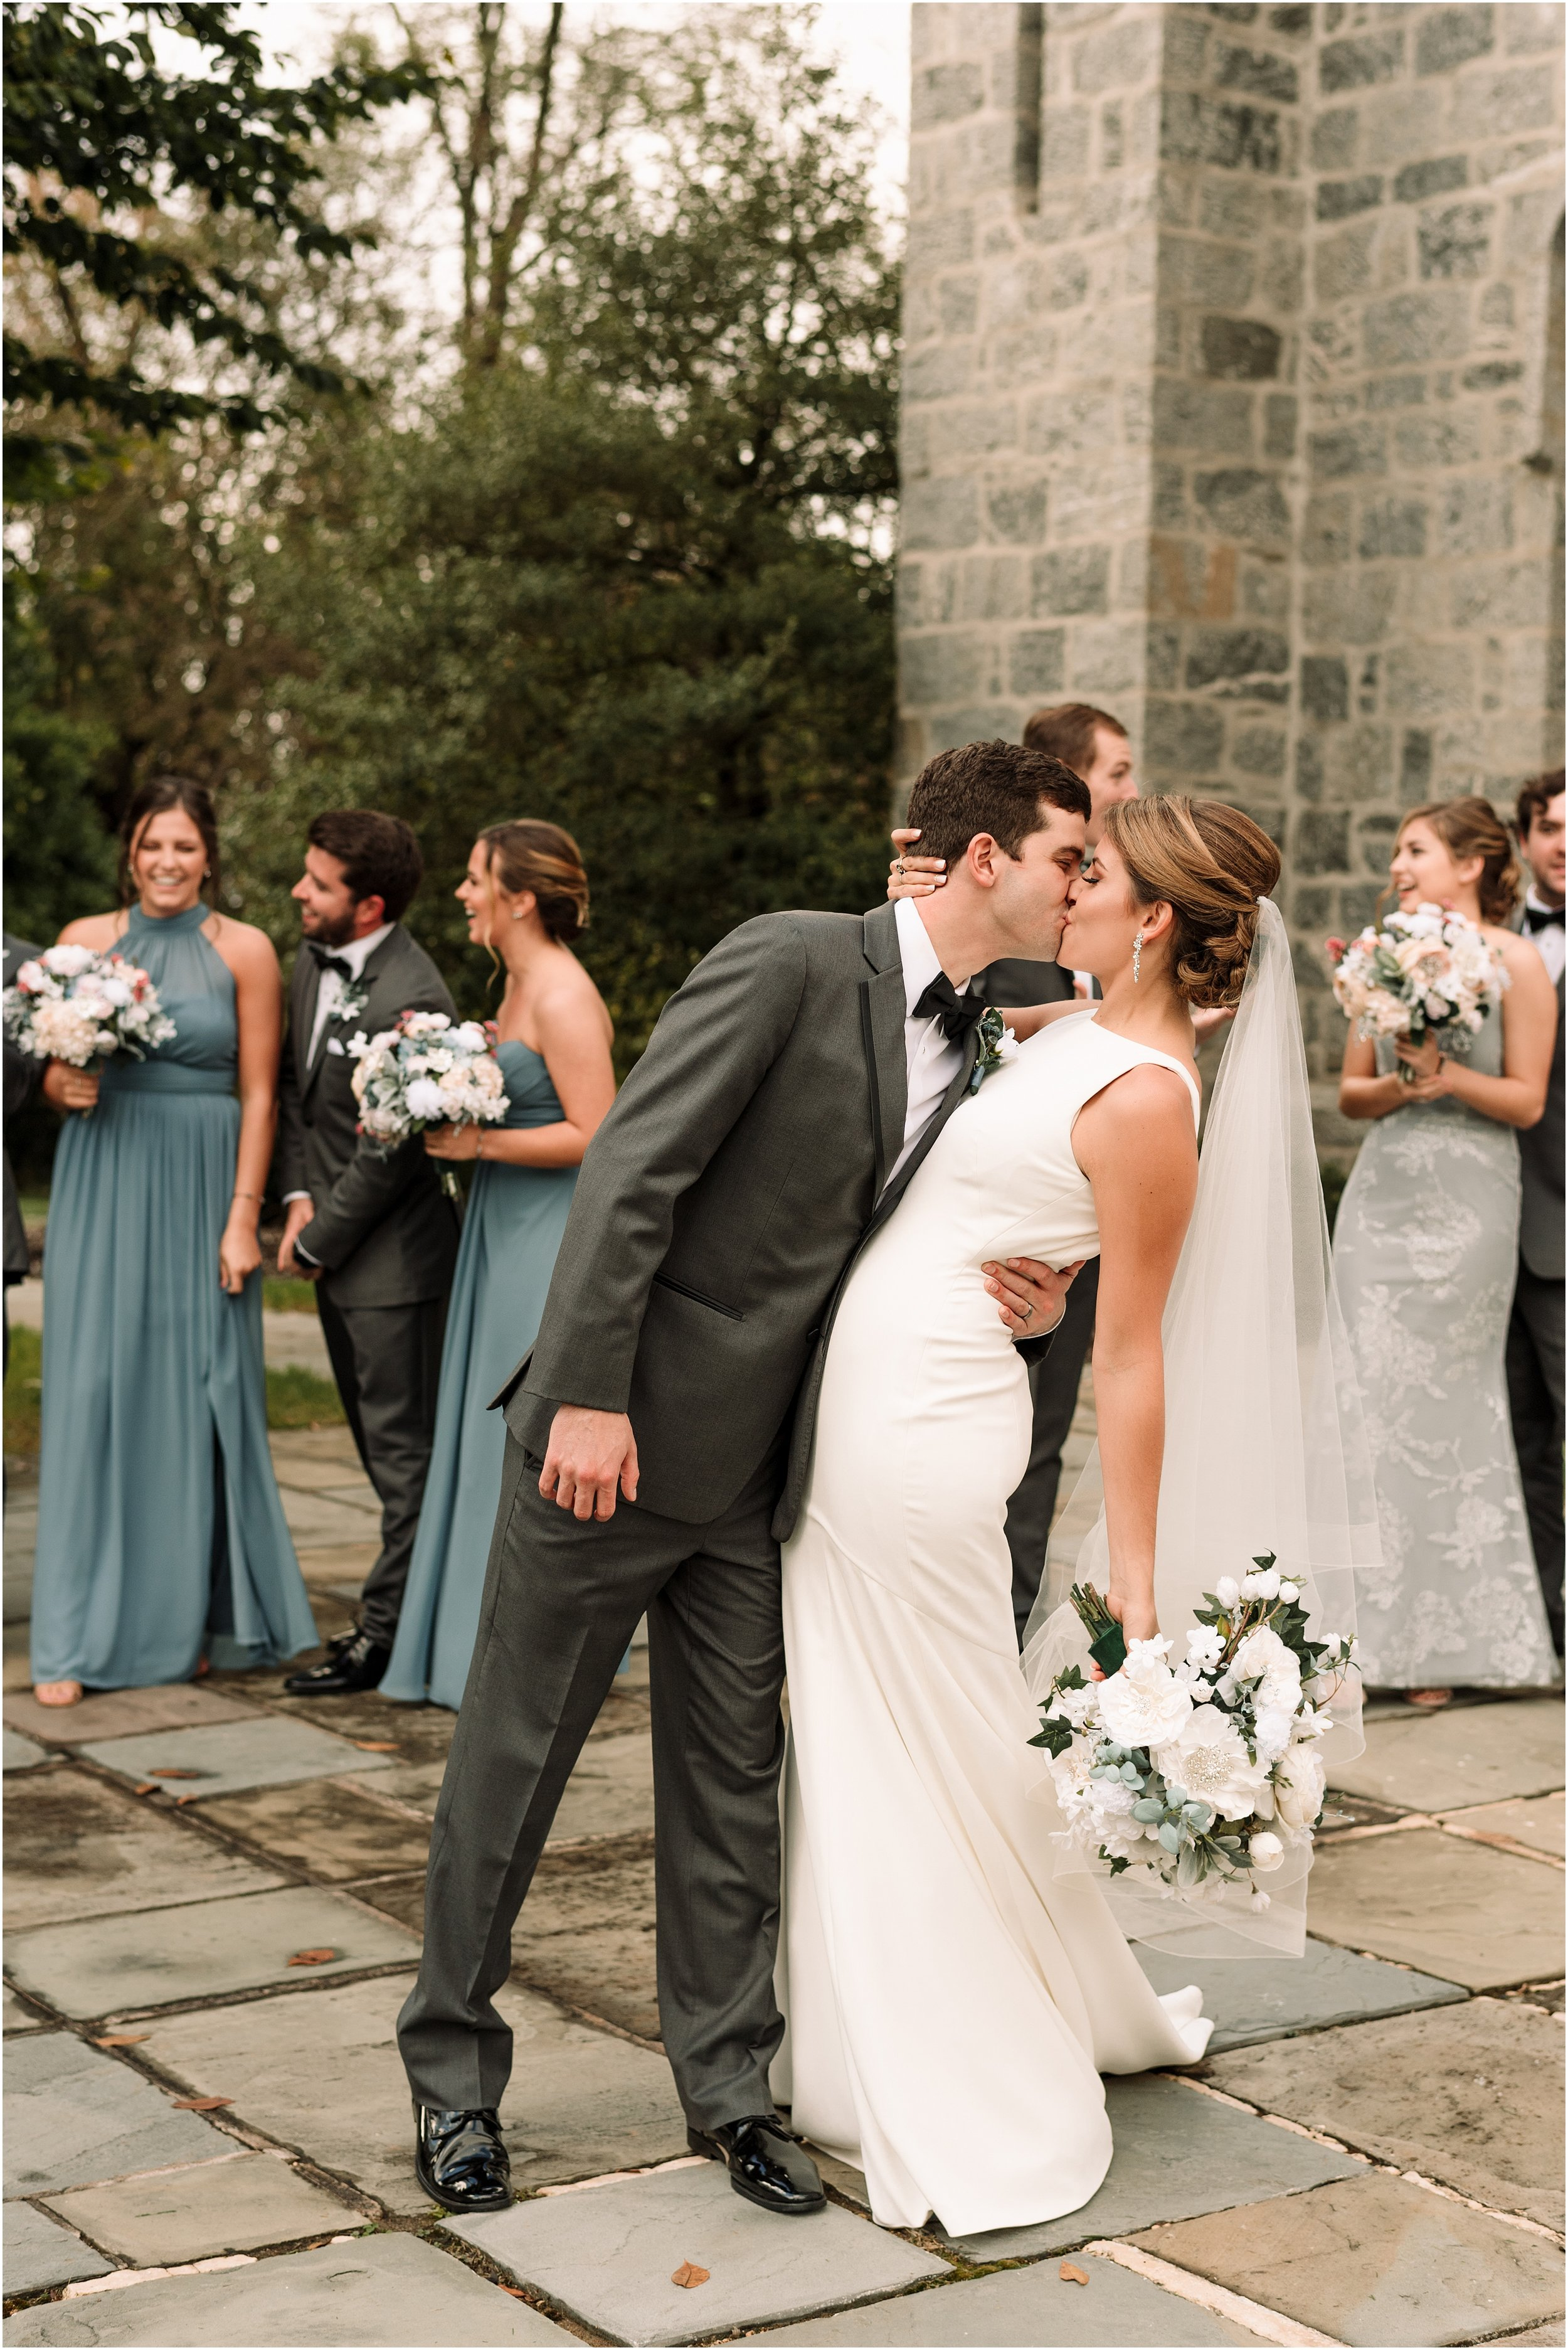 hannah leigh photography ellicott city church wedding baltimore md_2110.jpg